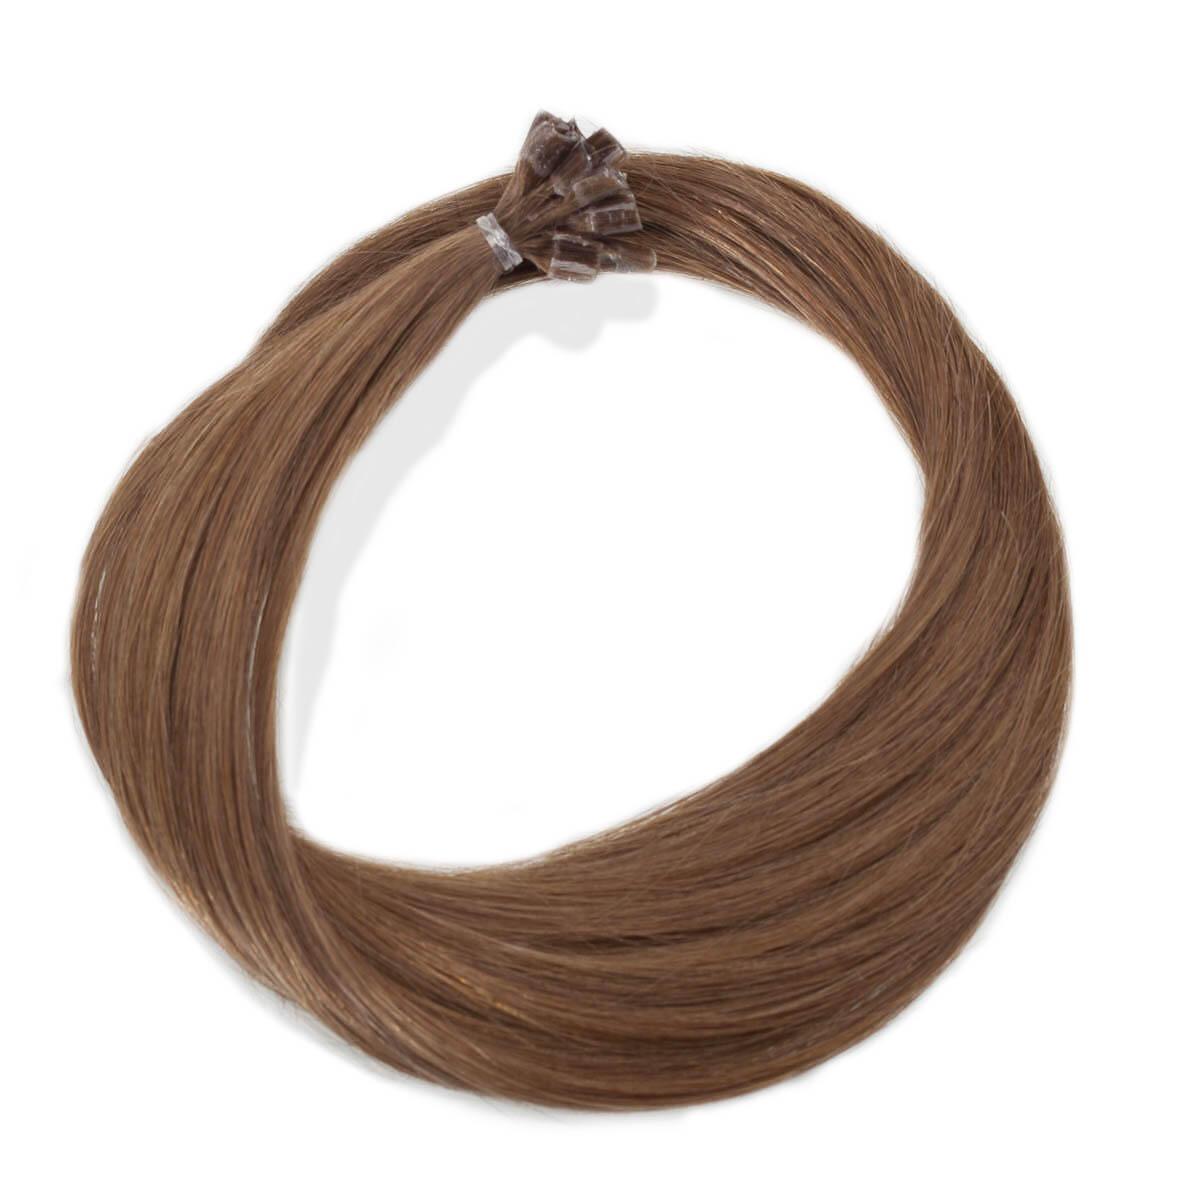 Nail Hair Original 5.1 Medium Ash Brown 50 cm